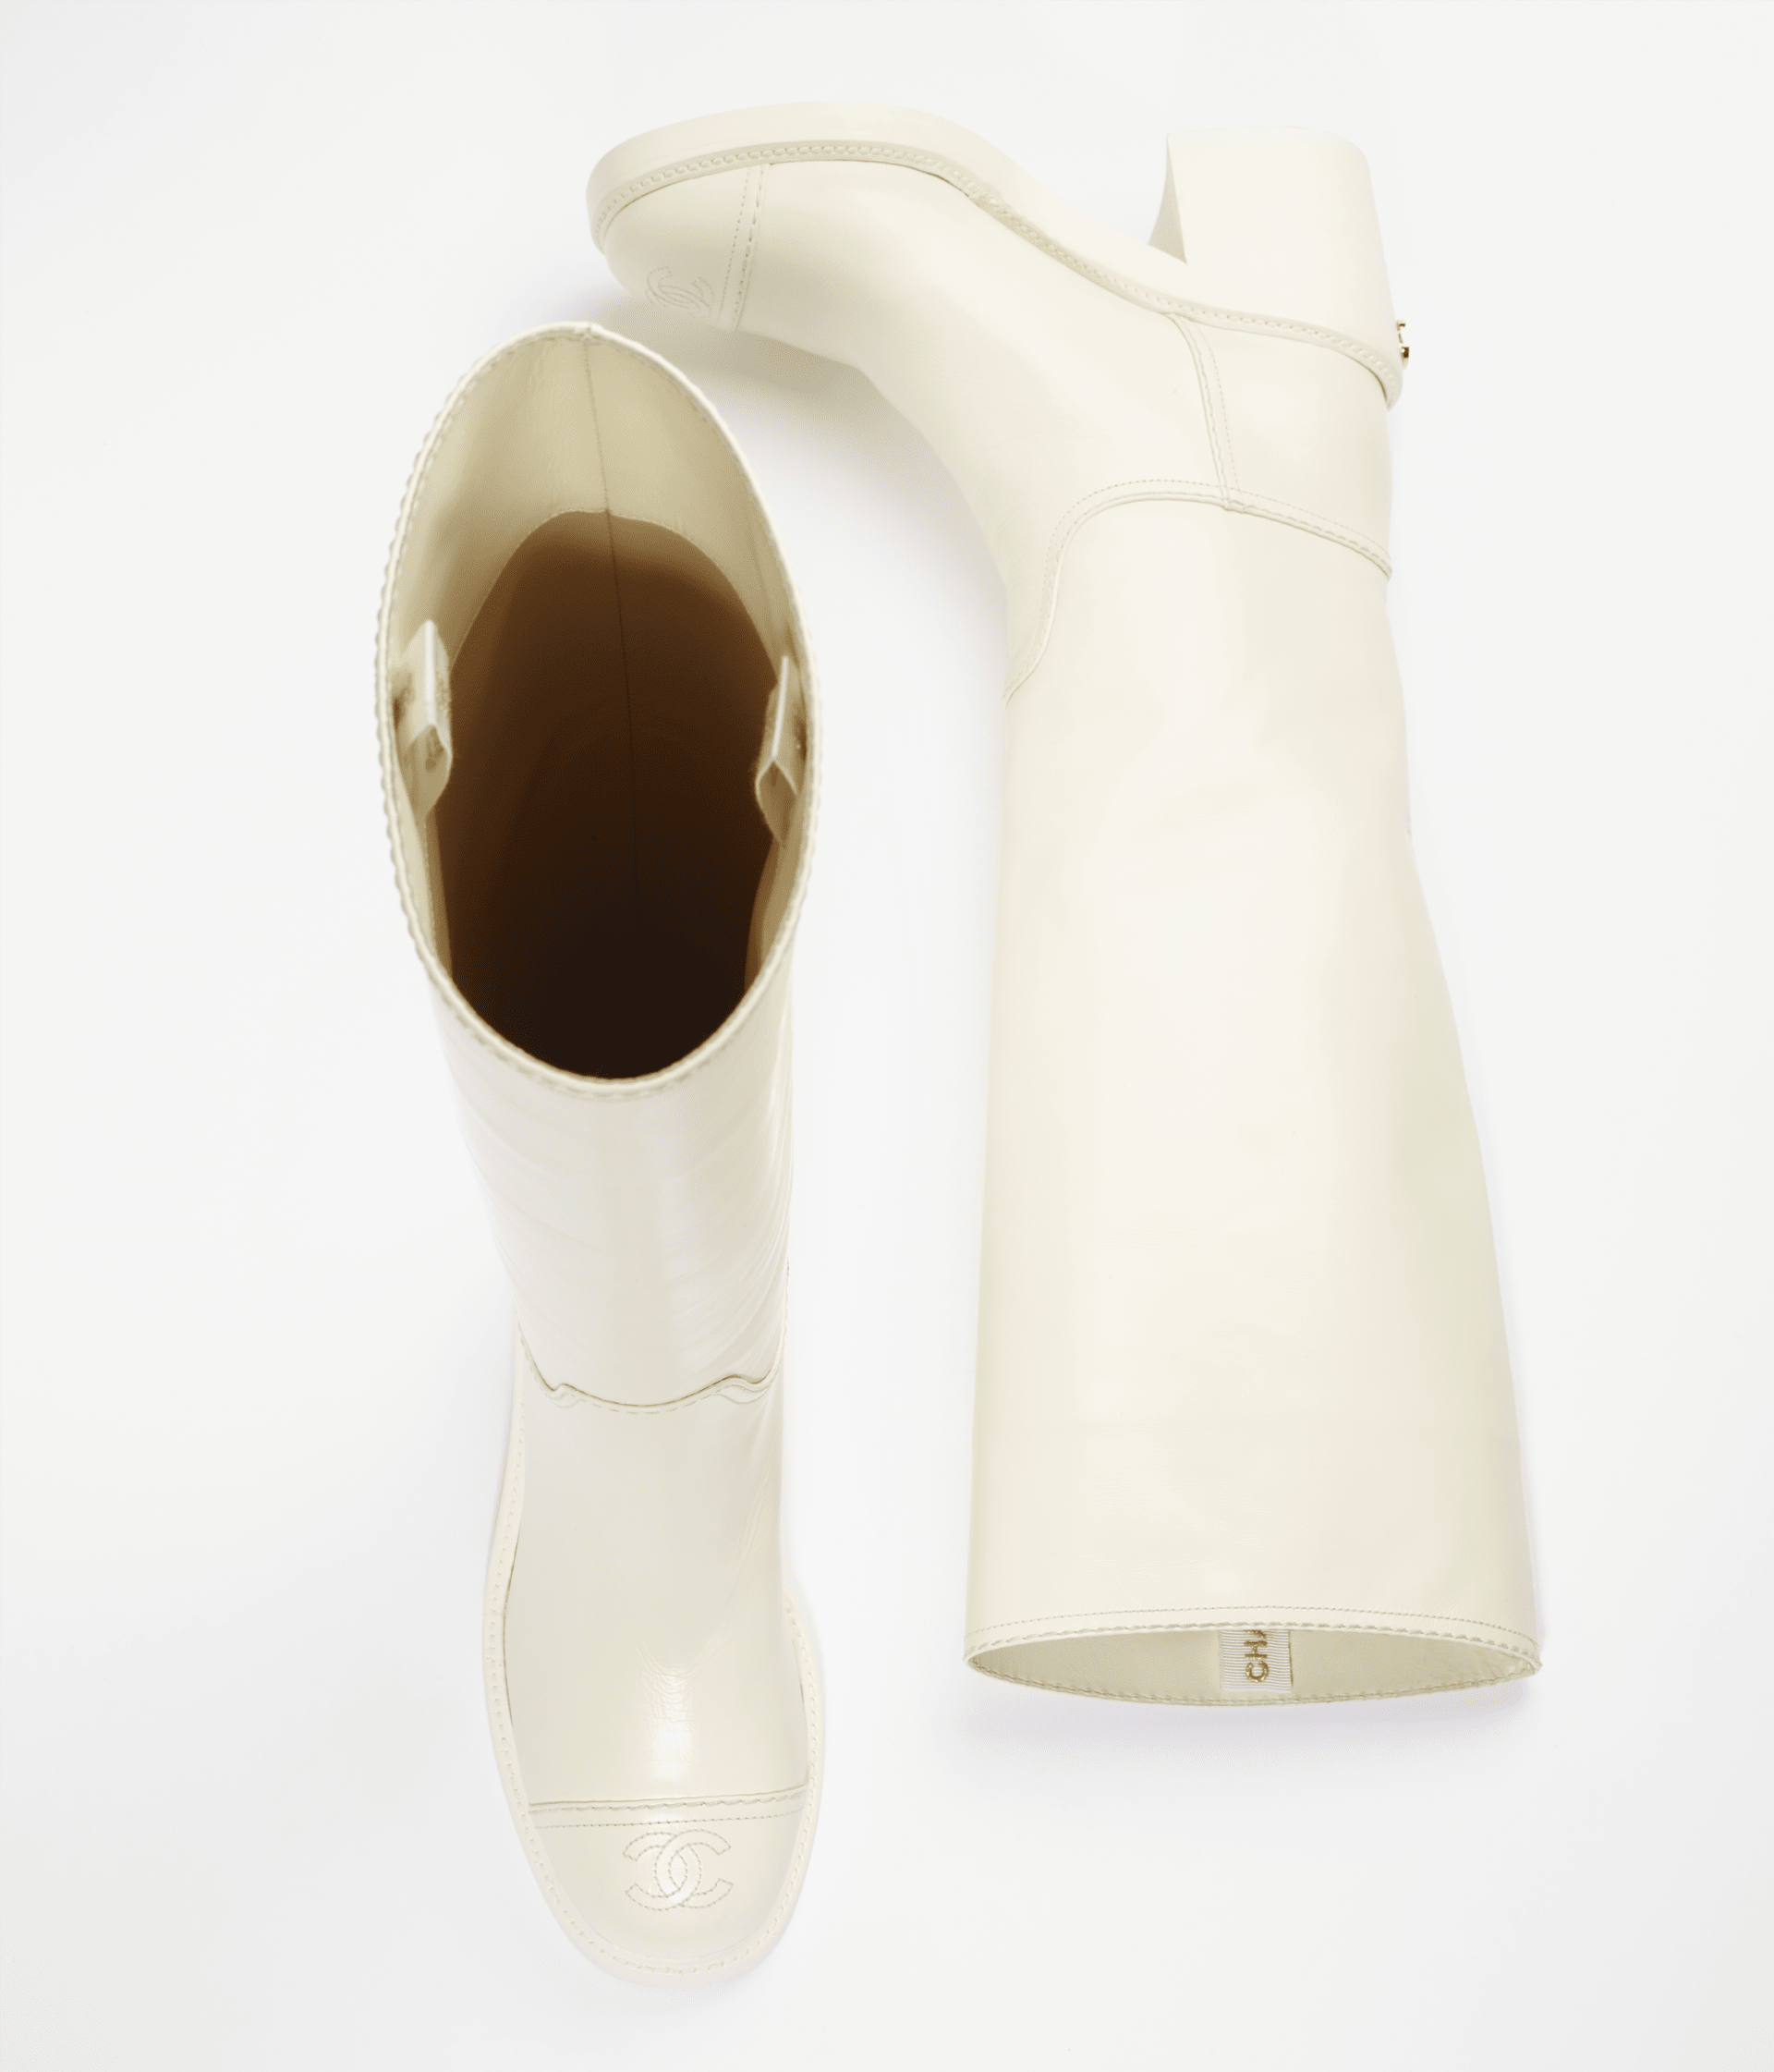 image 2 - High Boots - Calfskin - White